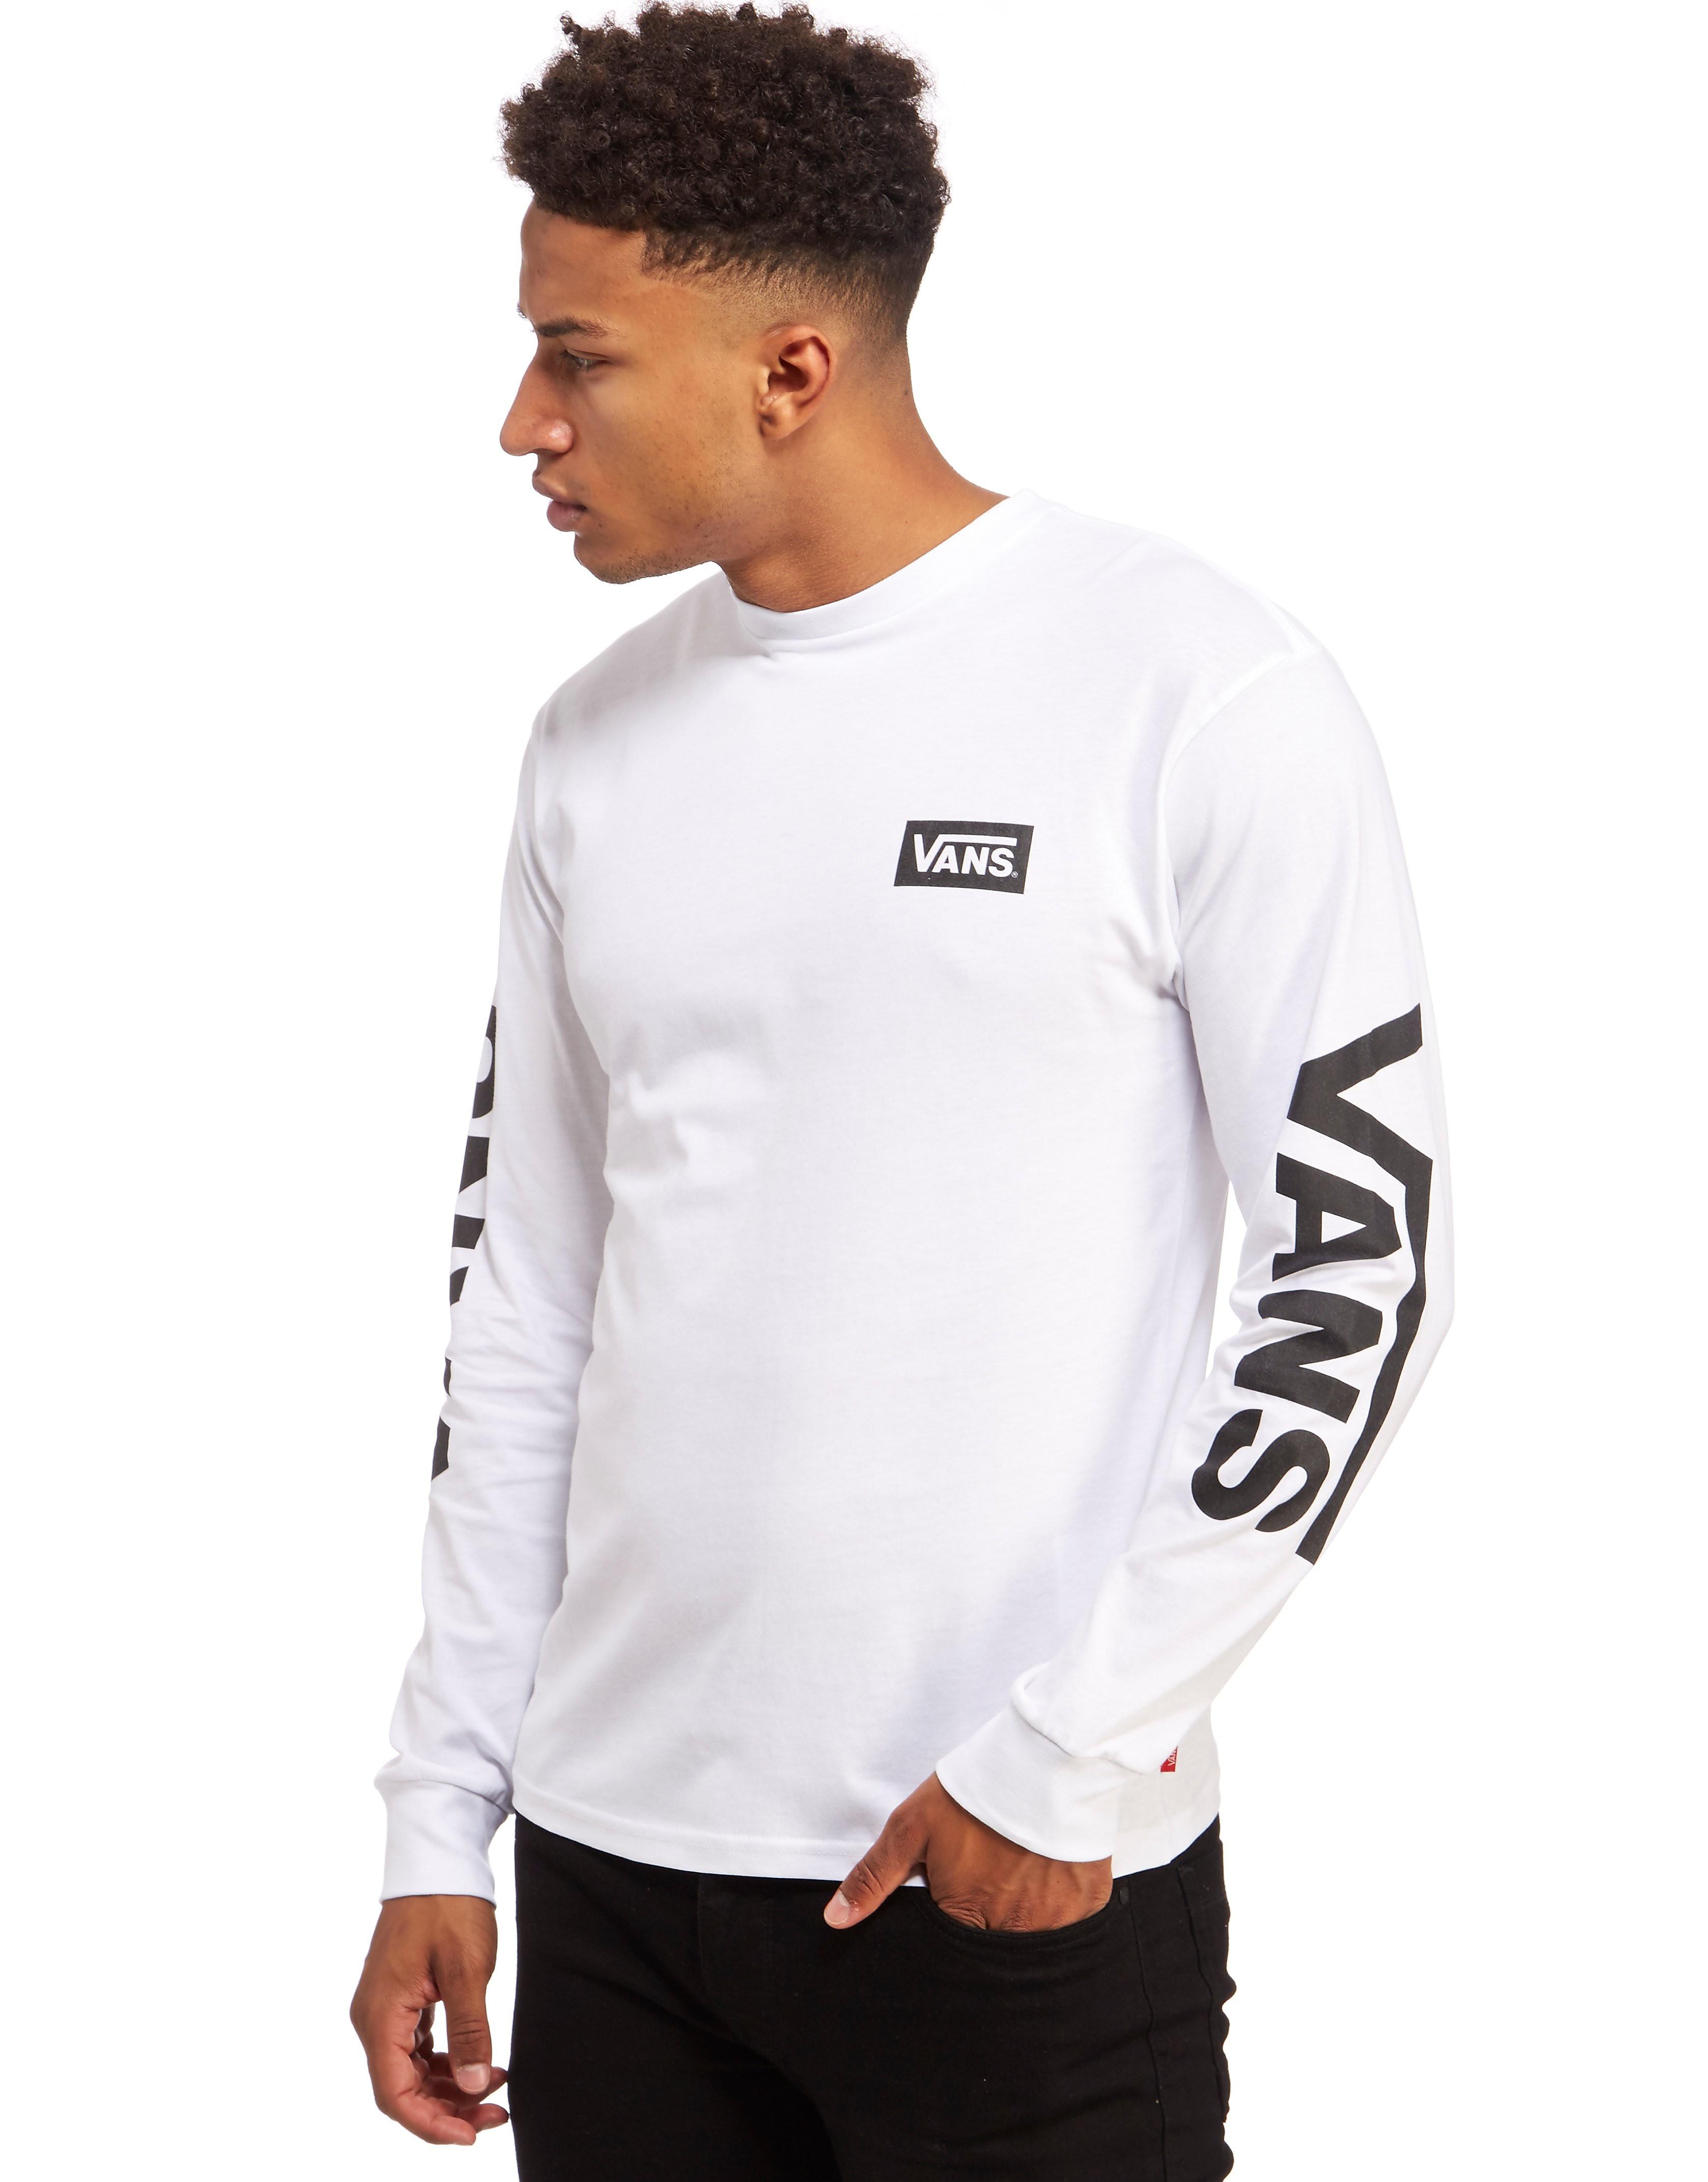 Vans Classic Longsleeve T-Shirt